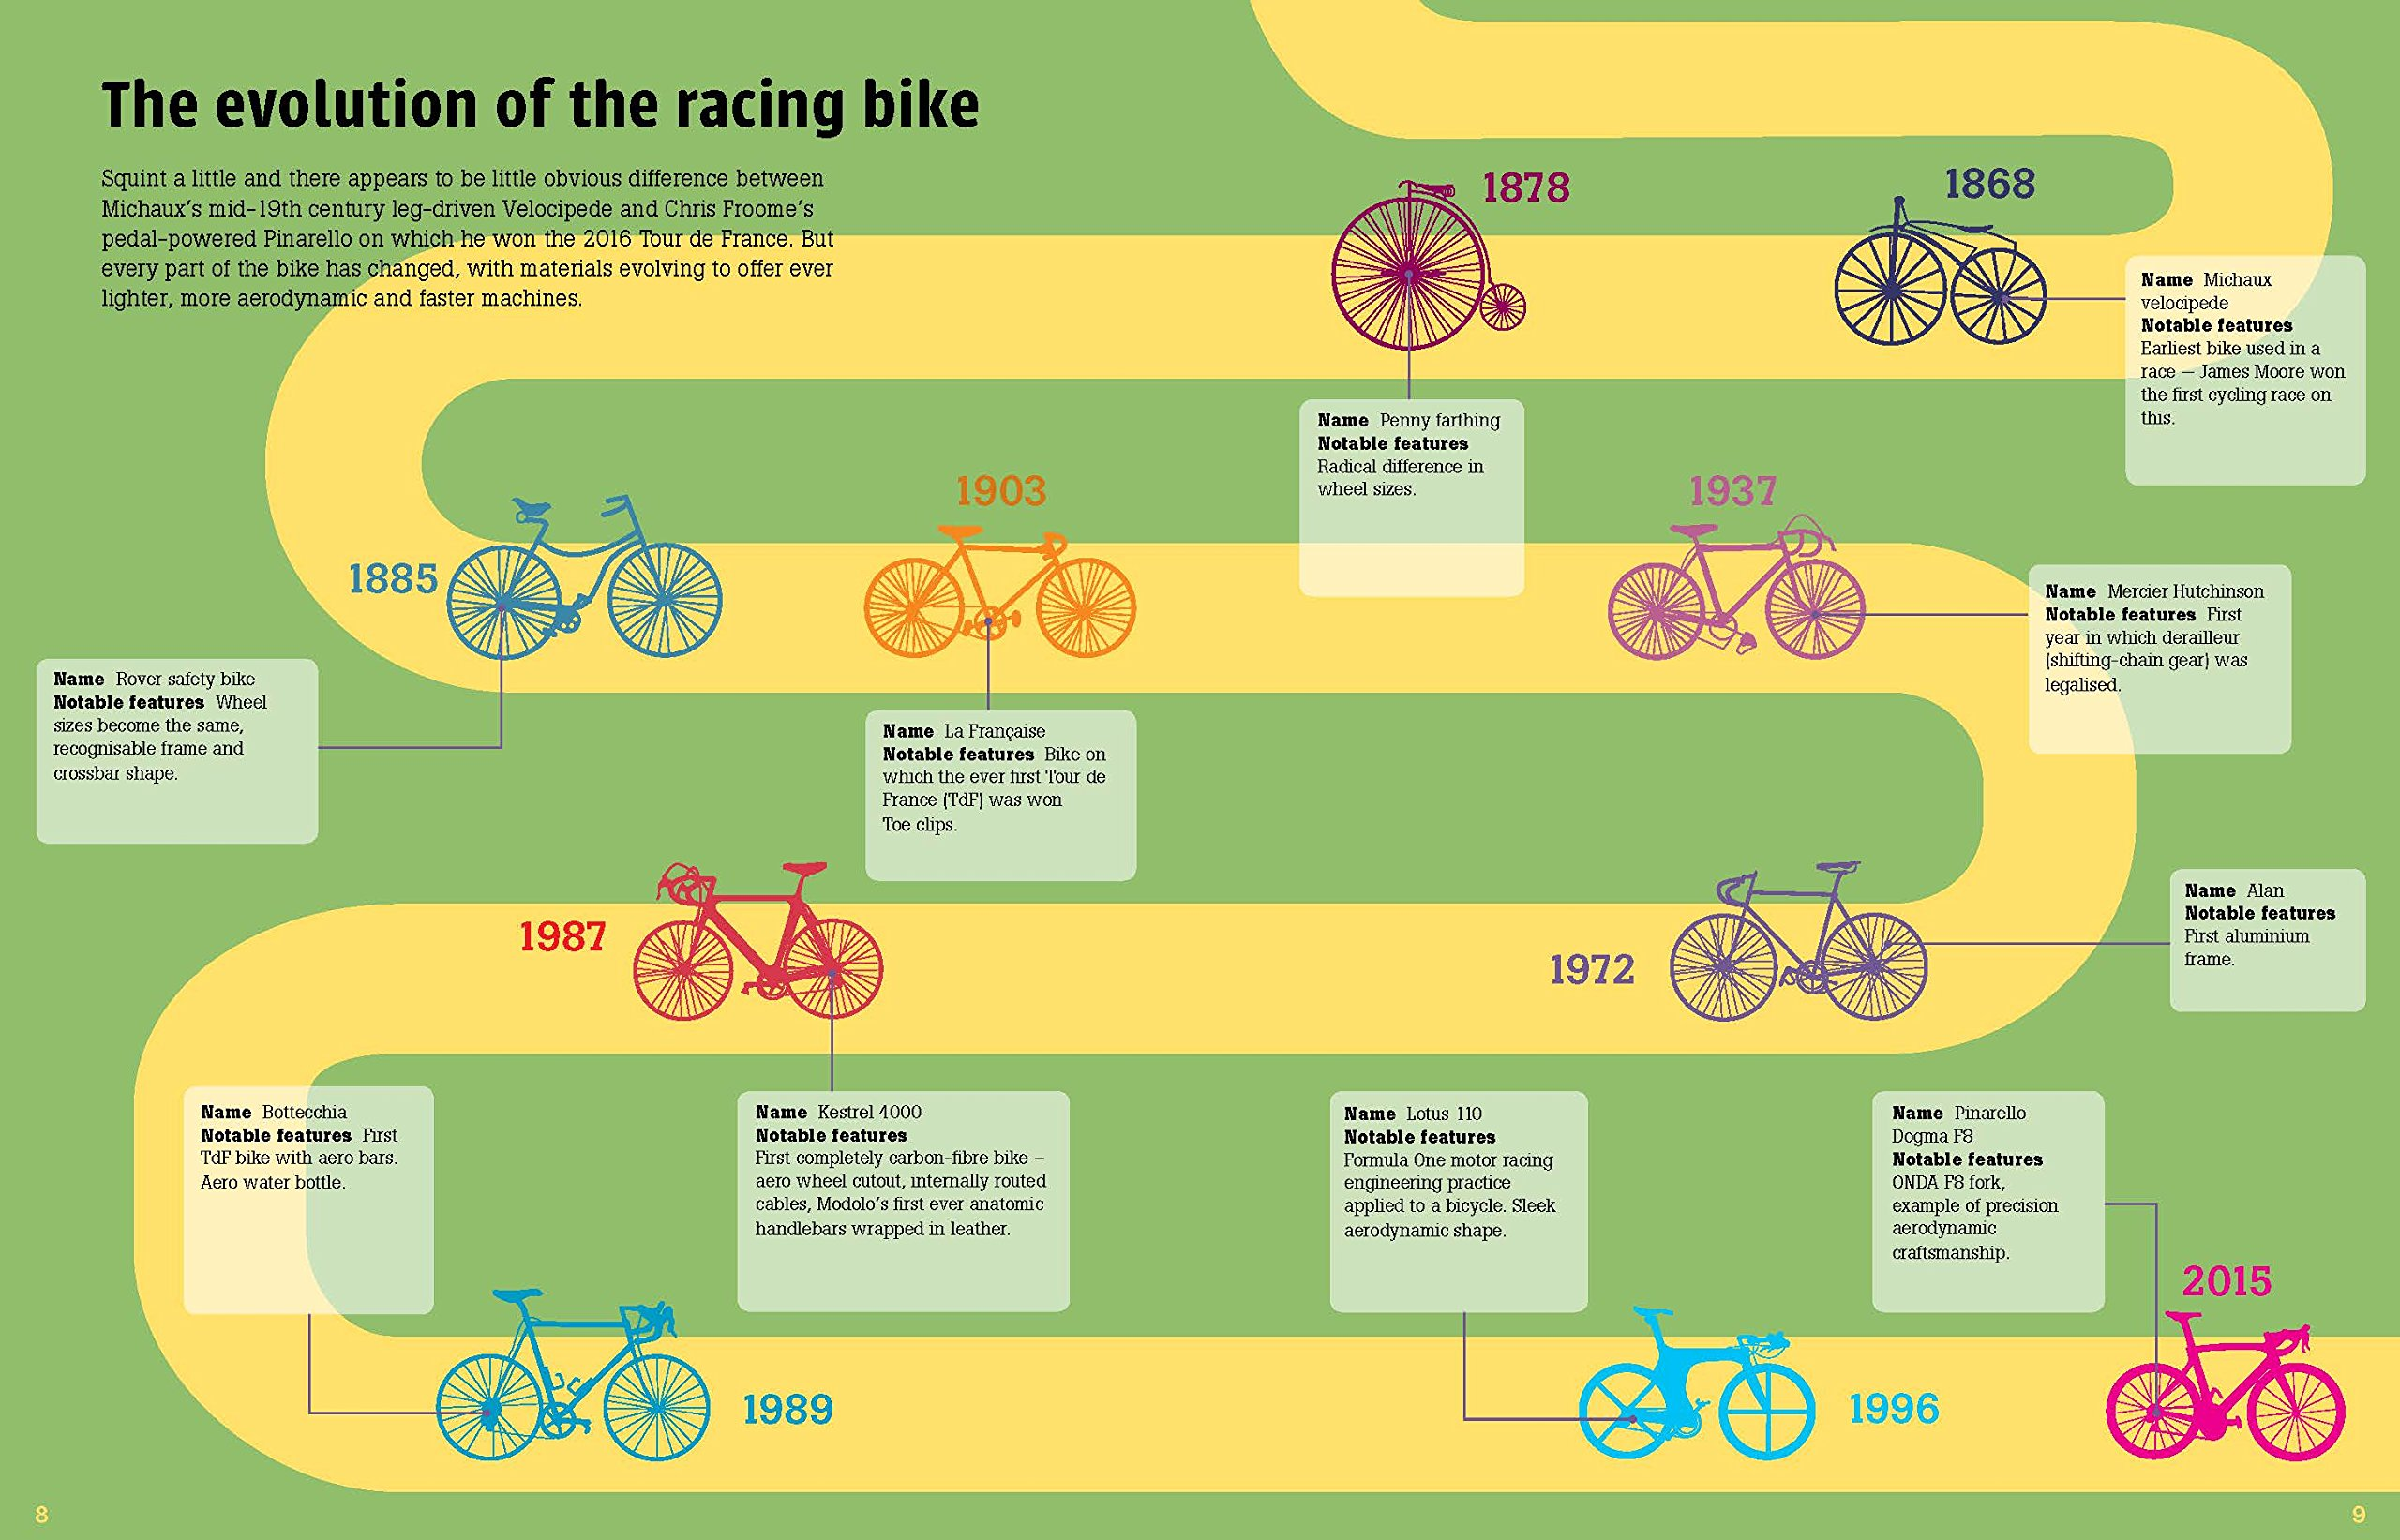 Evolution of the racing bike infographic